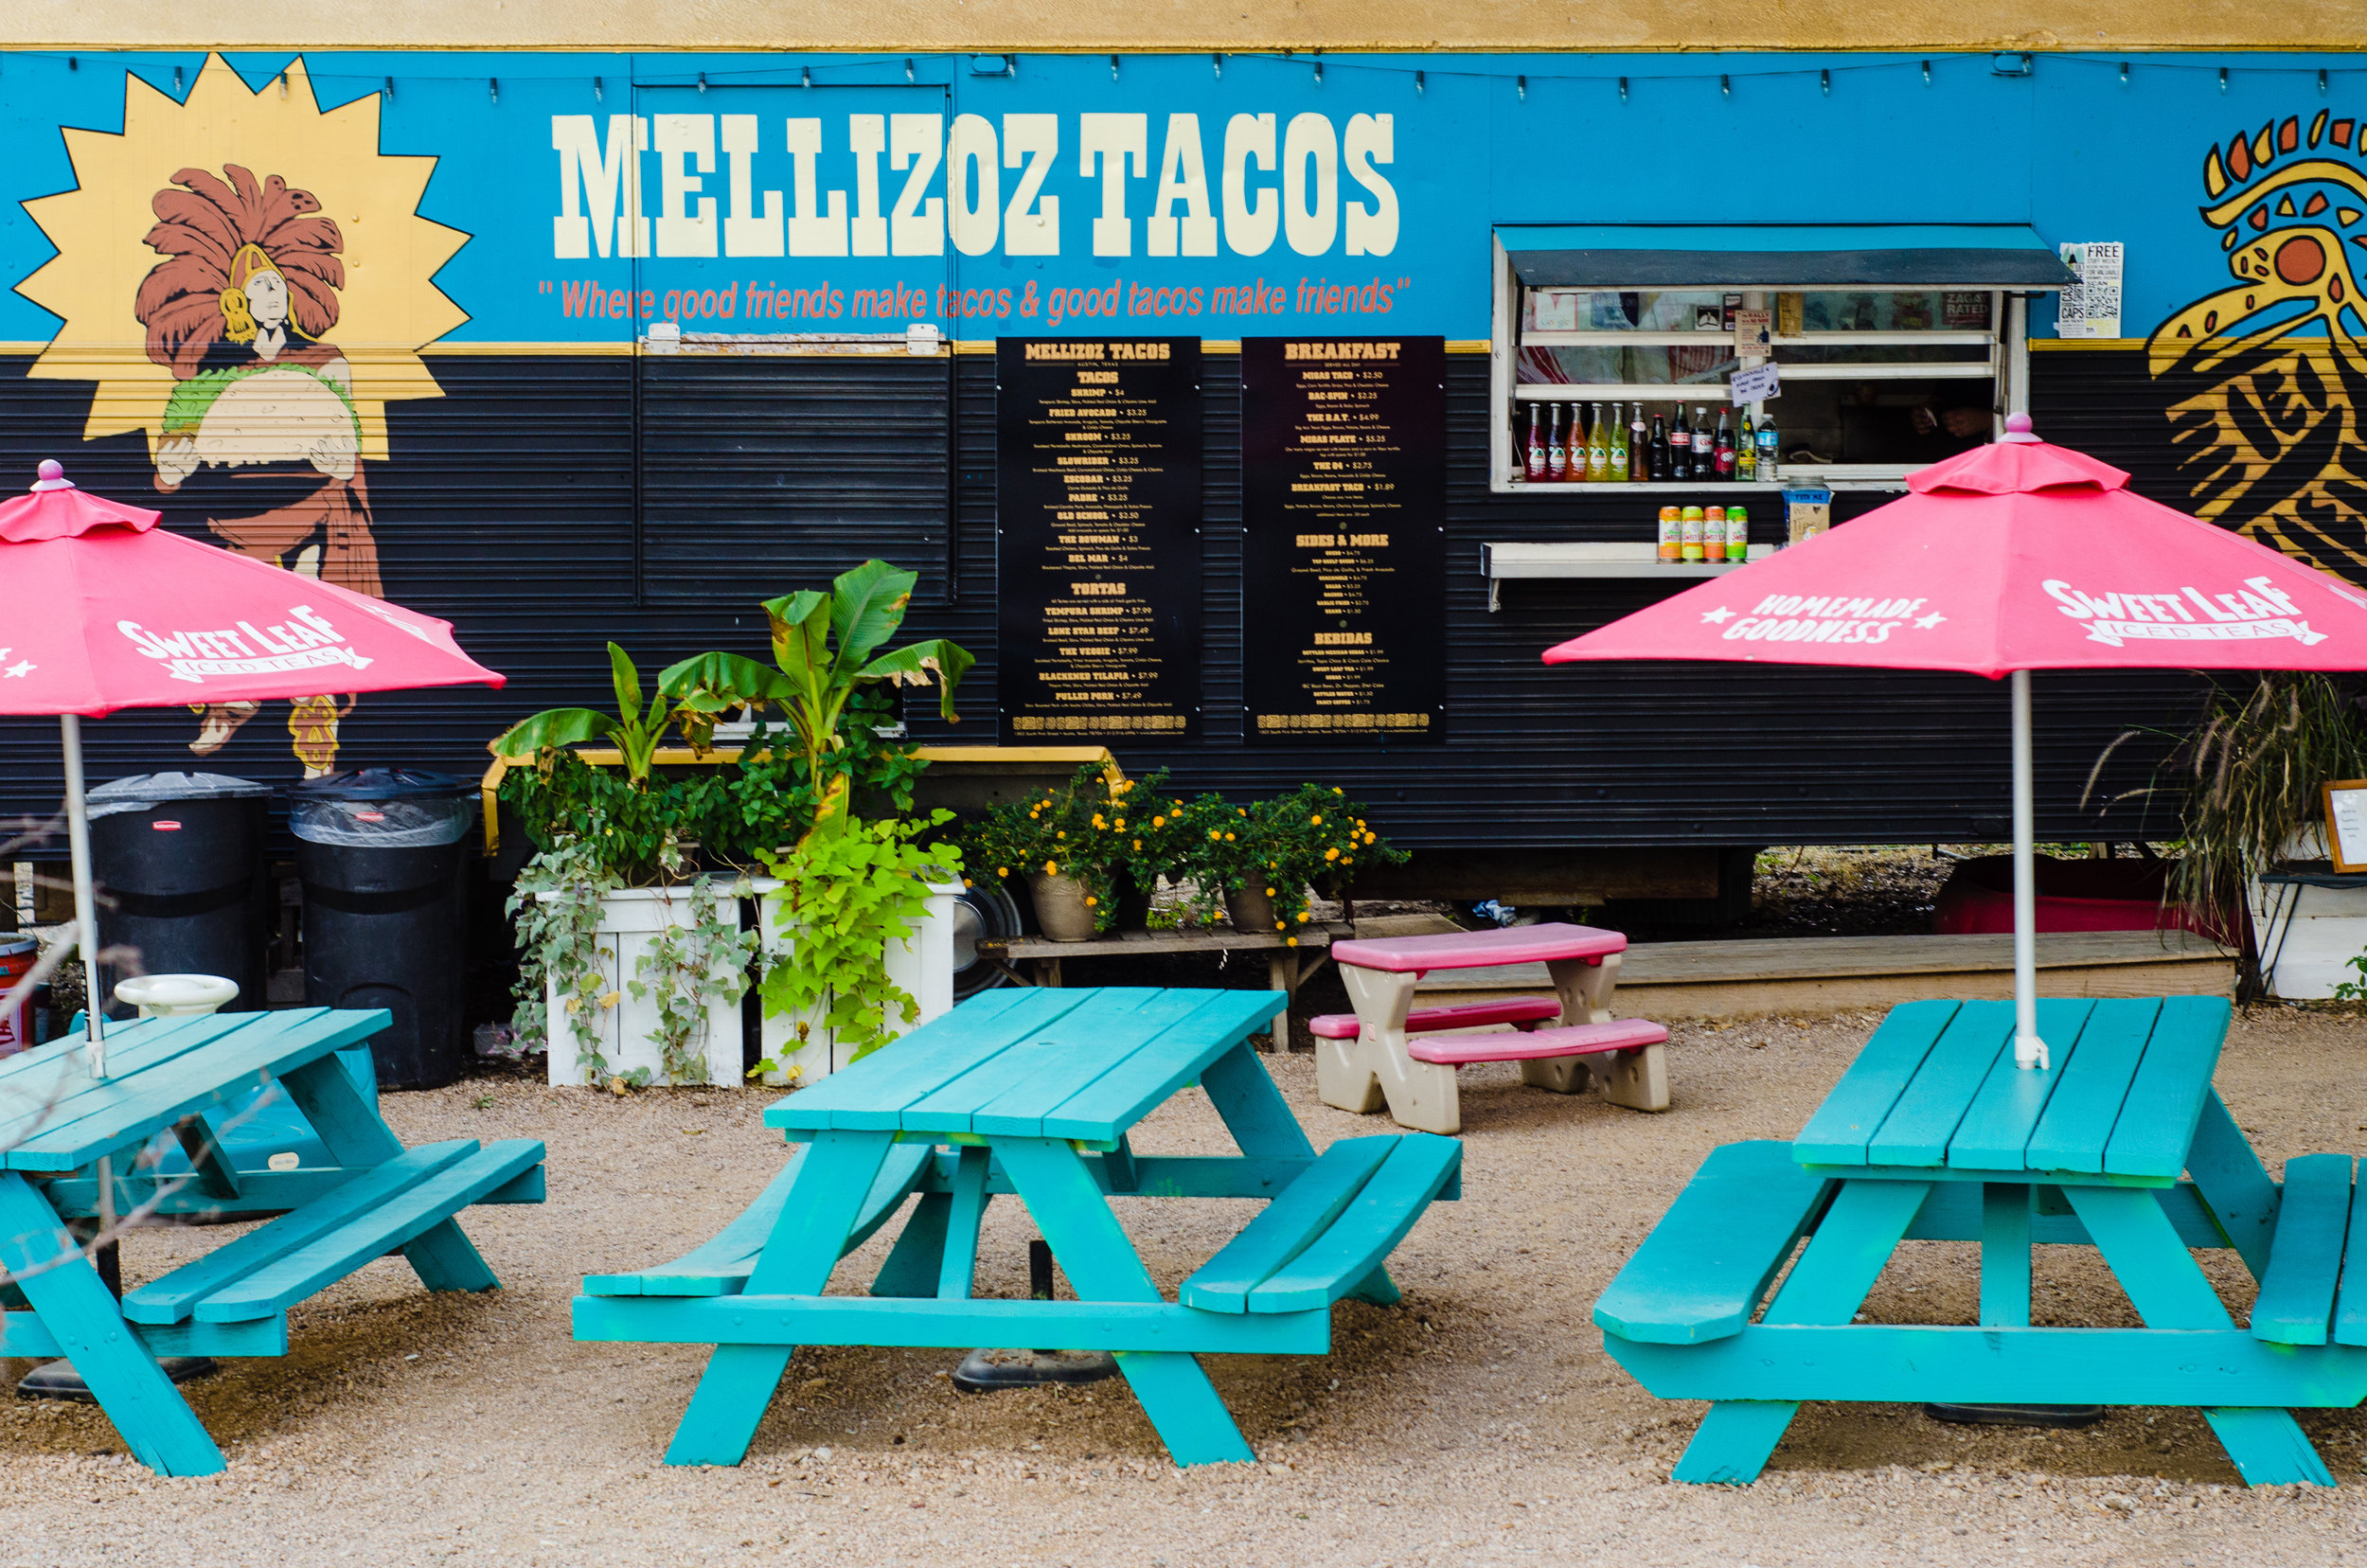 mellizoz tacos-0011.jpg